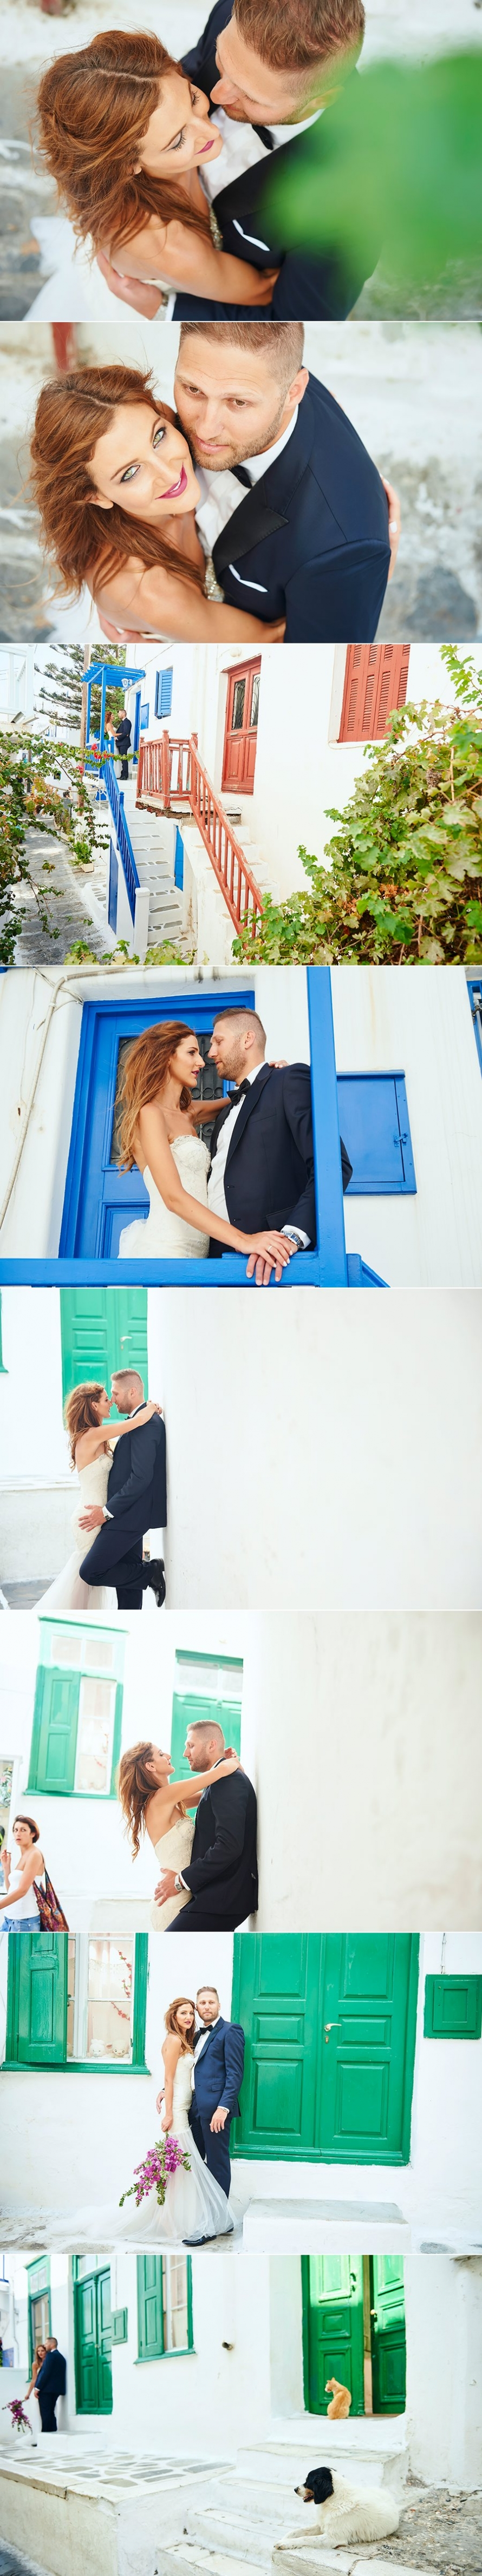 Gragan Gloria wedding photo 03